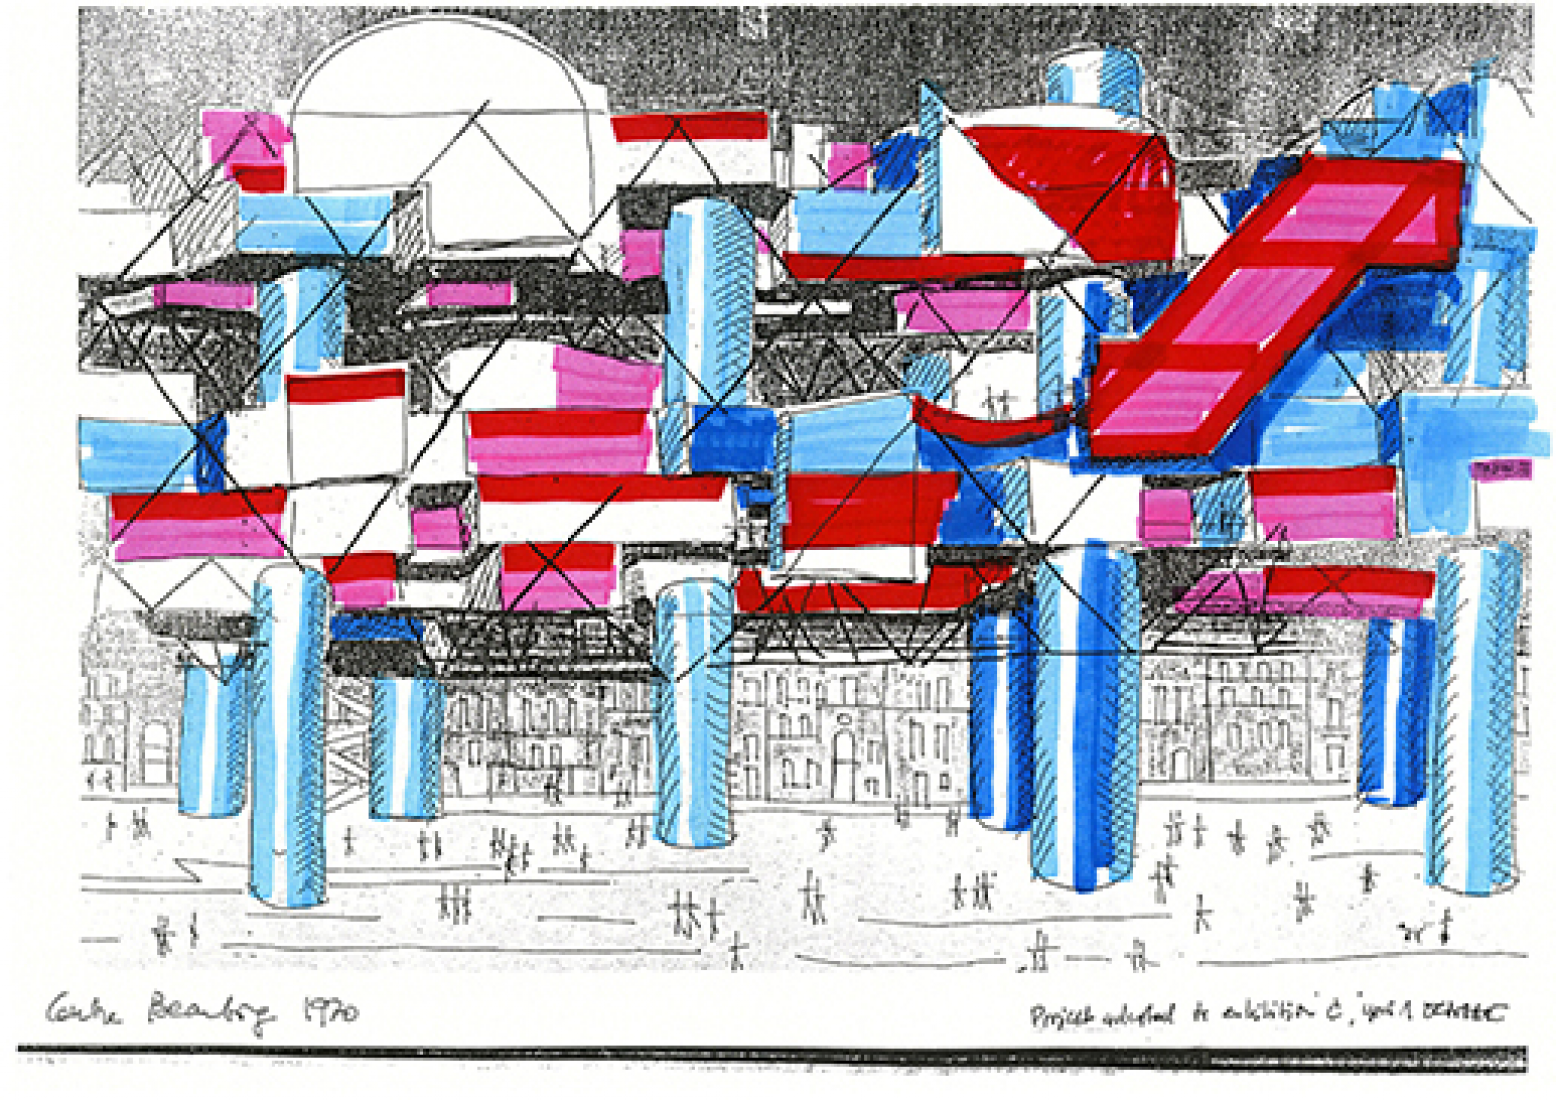 Yona Friedman Pompidou Center, Paris, 1970 © Yona Friedman